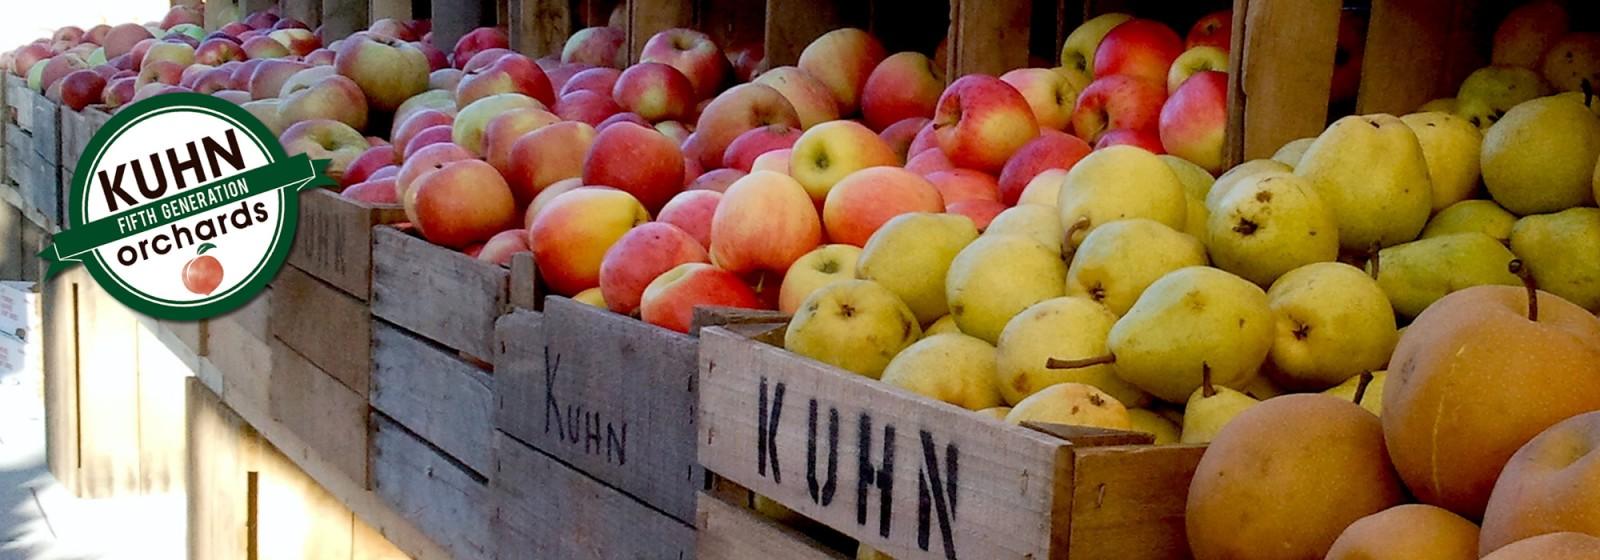 Farmers-Market-Apples-2